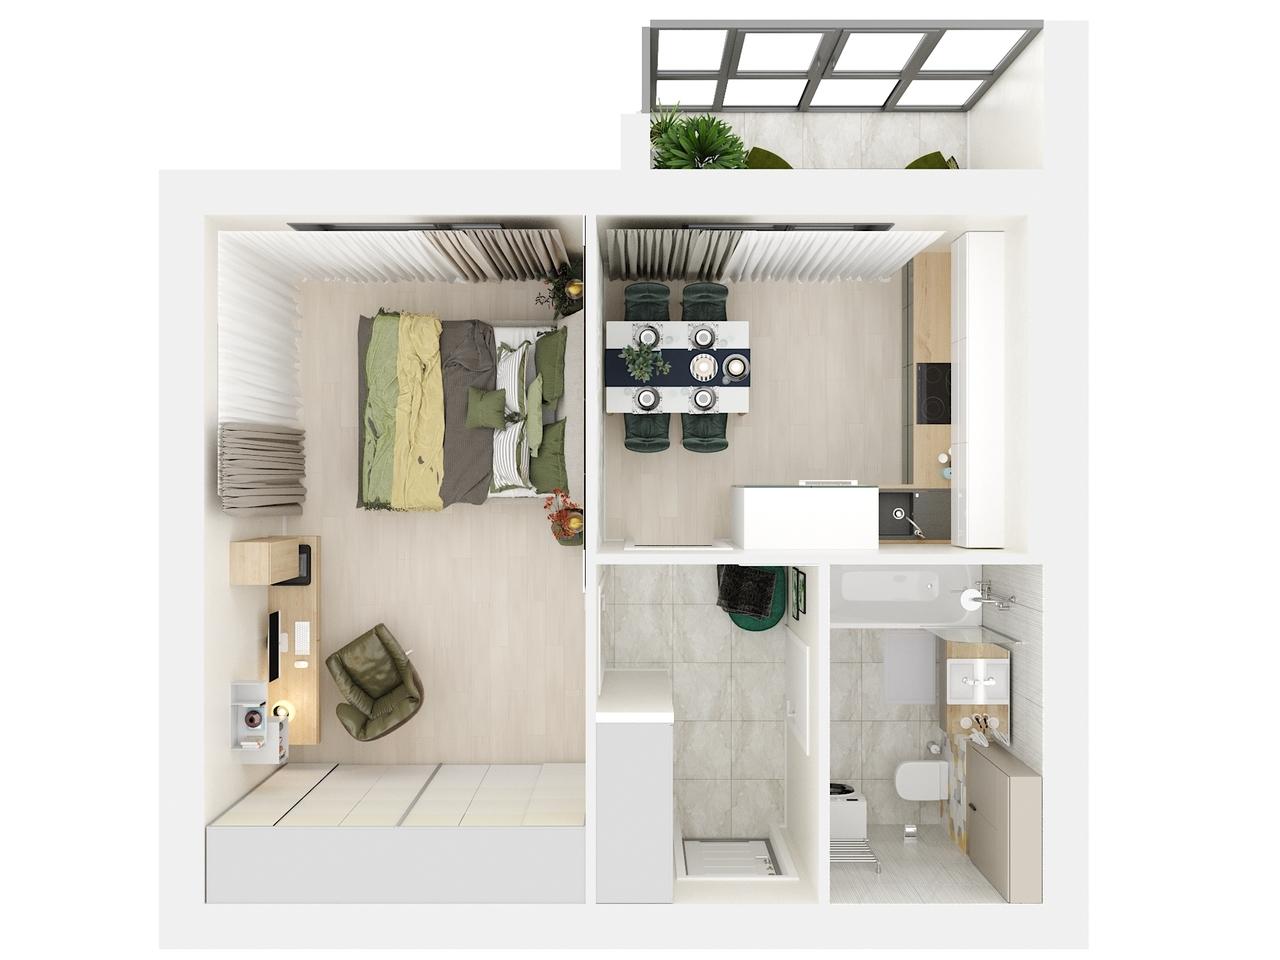 Дом 1 - 1-комнатная №3